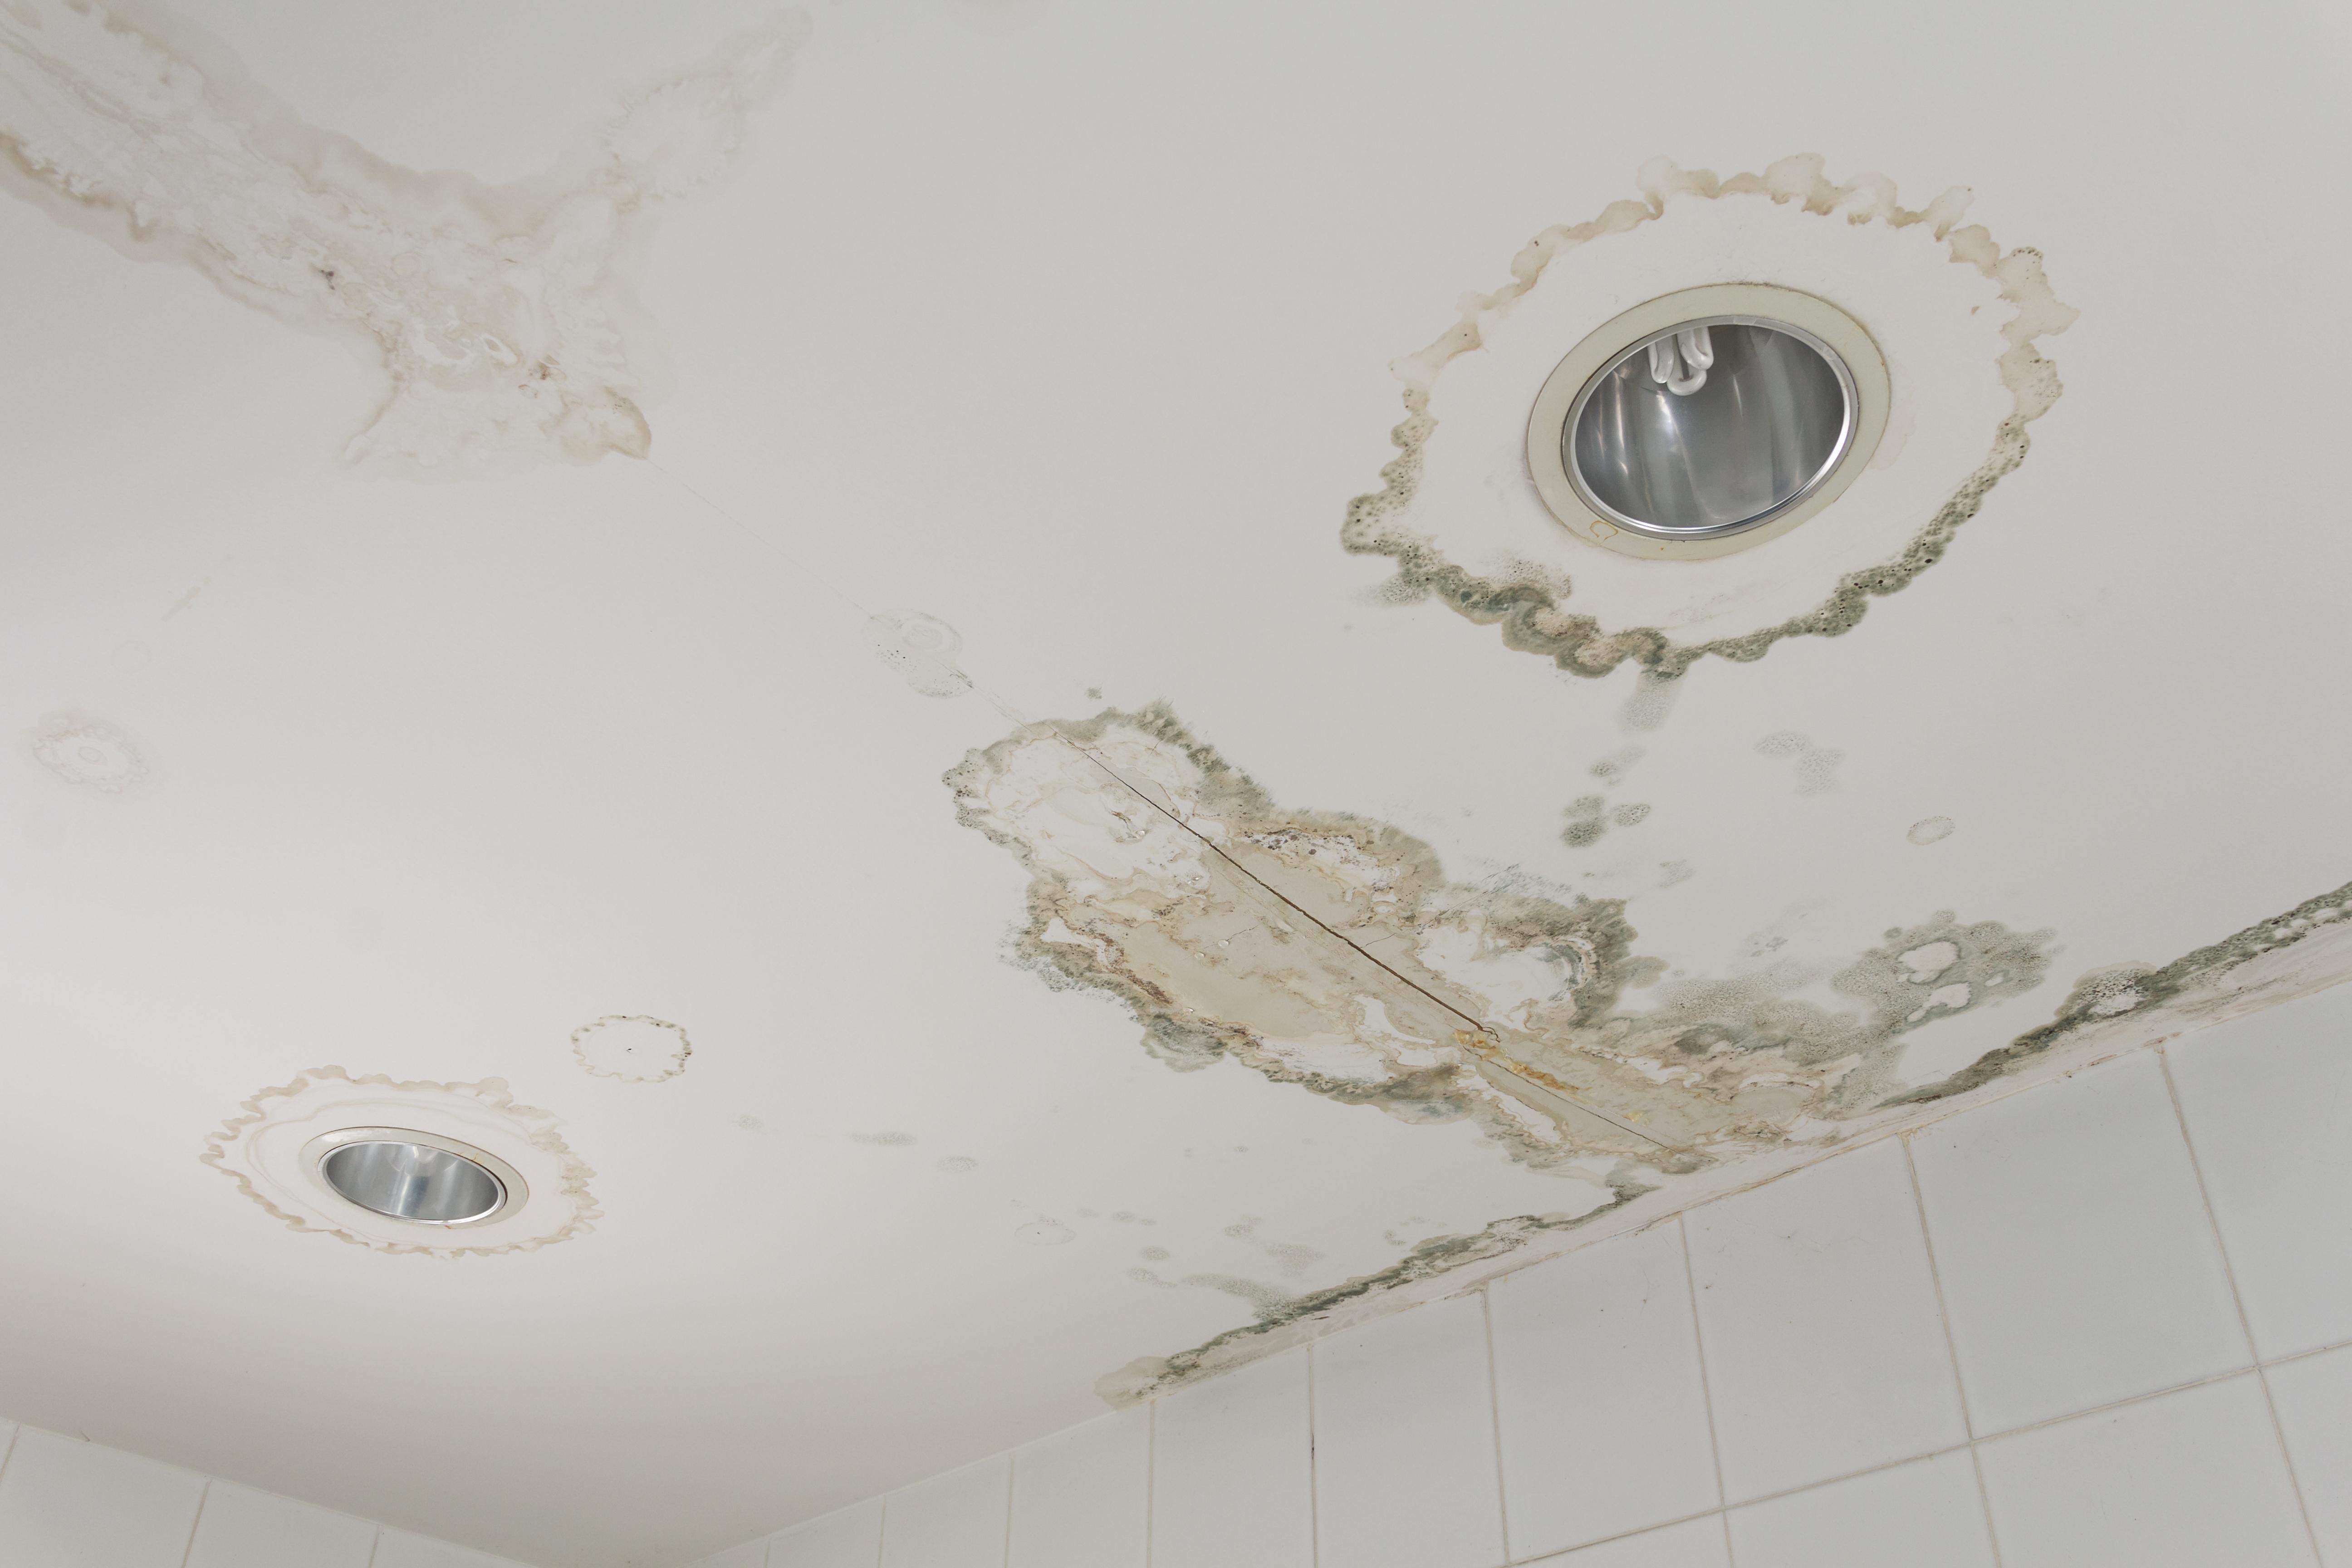 Home mold